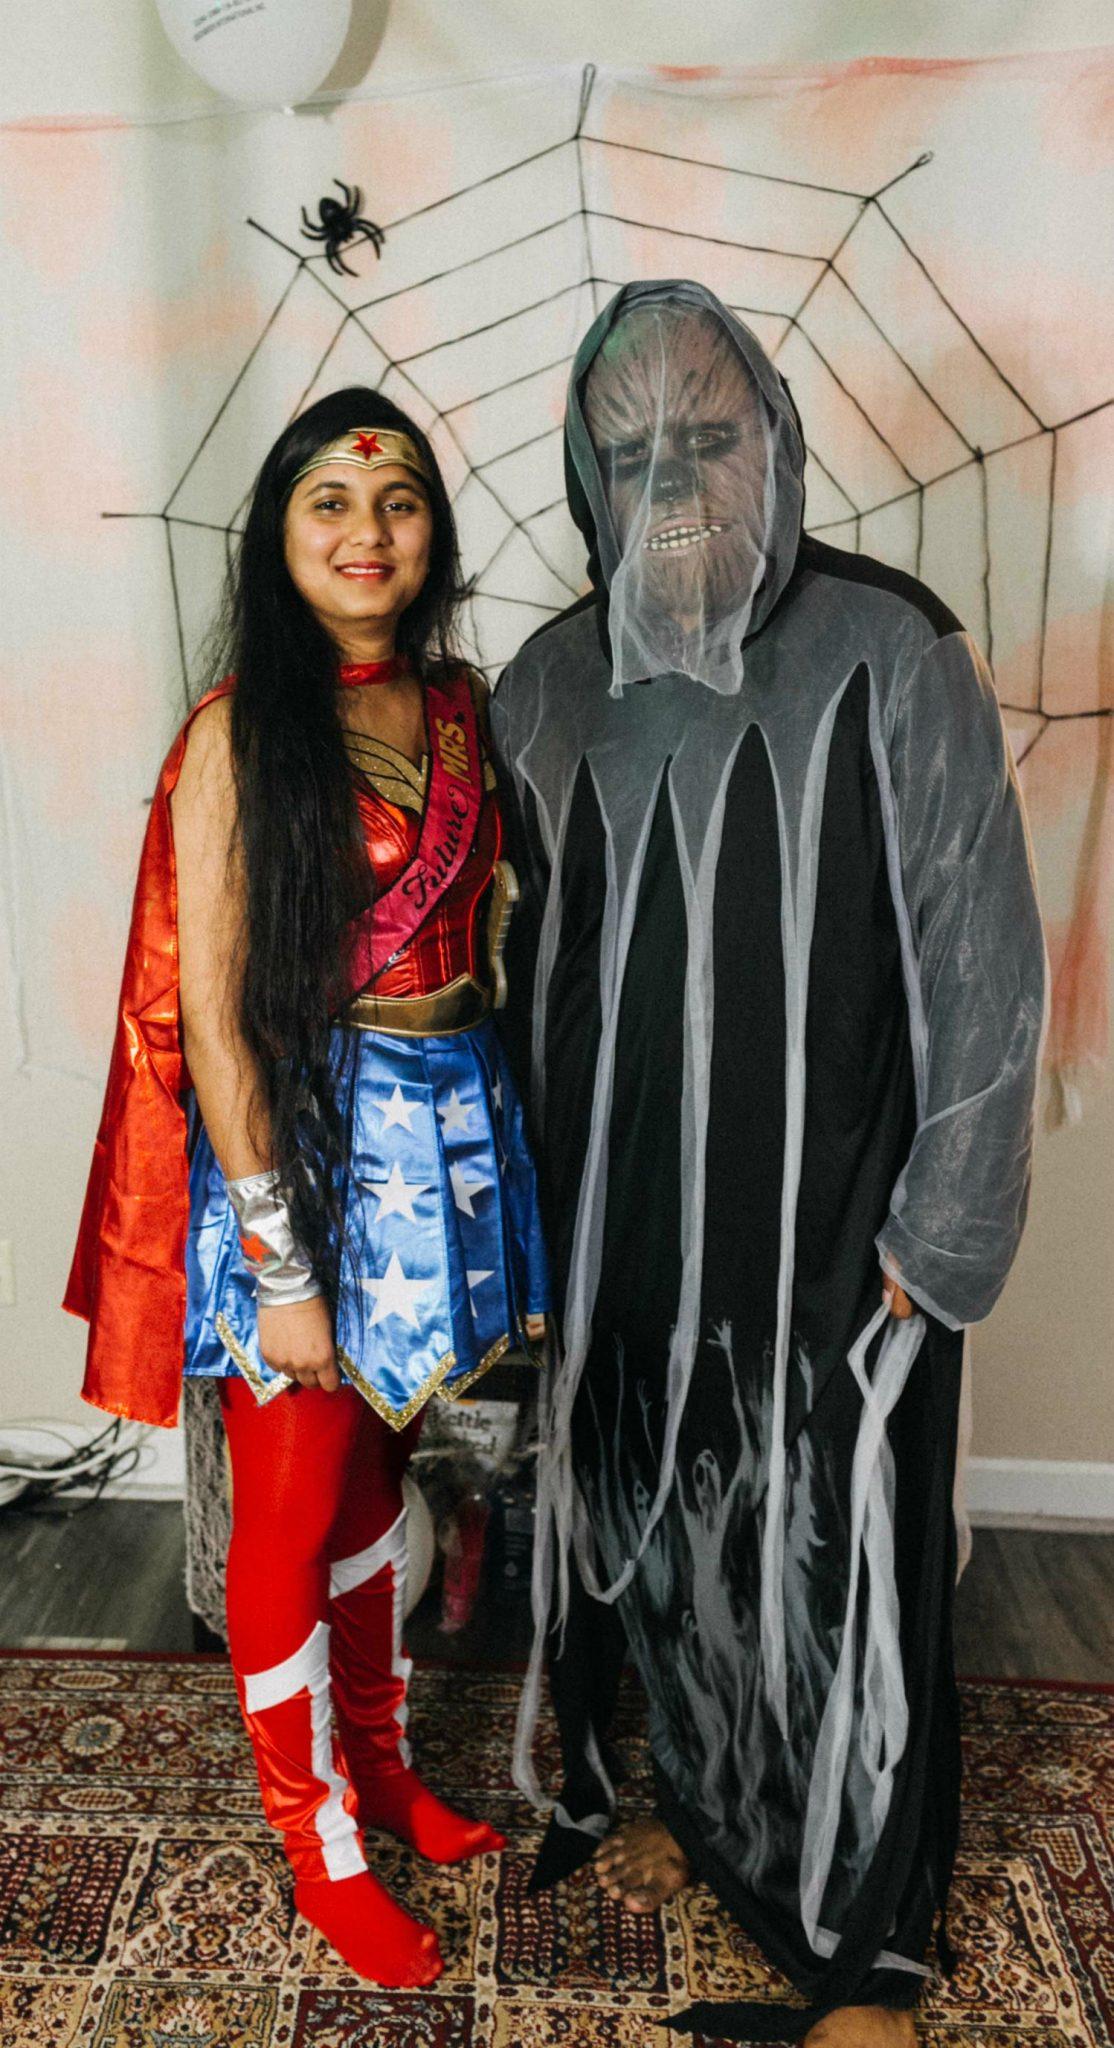 Halloween Bachelorette bride and groom costumesv